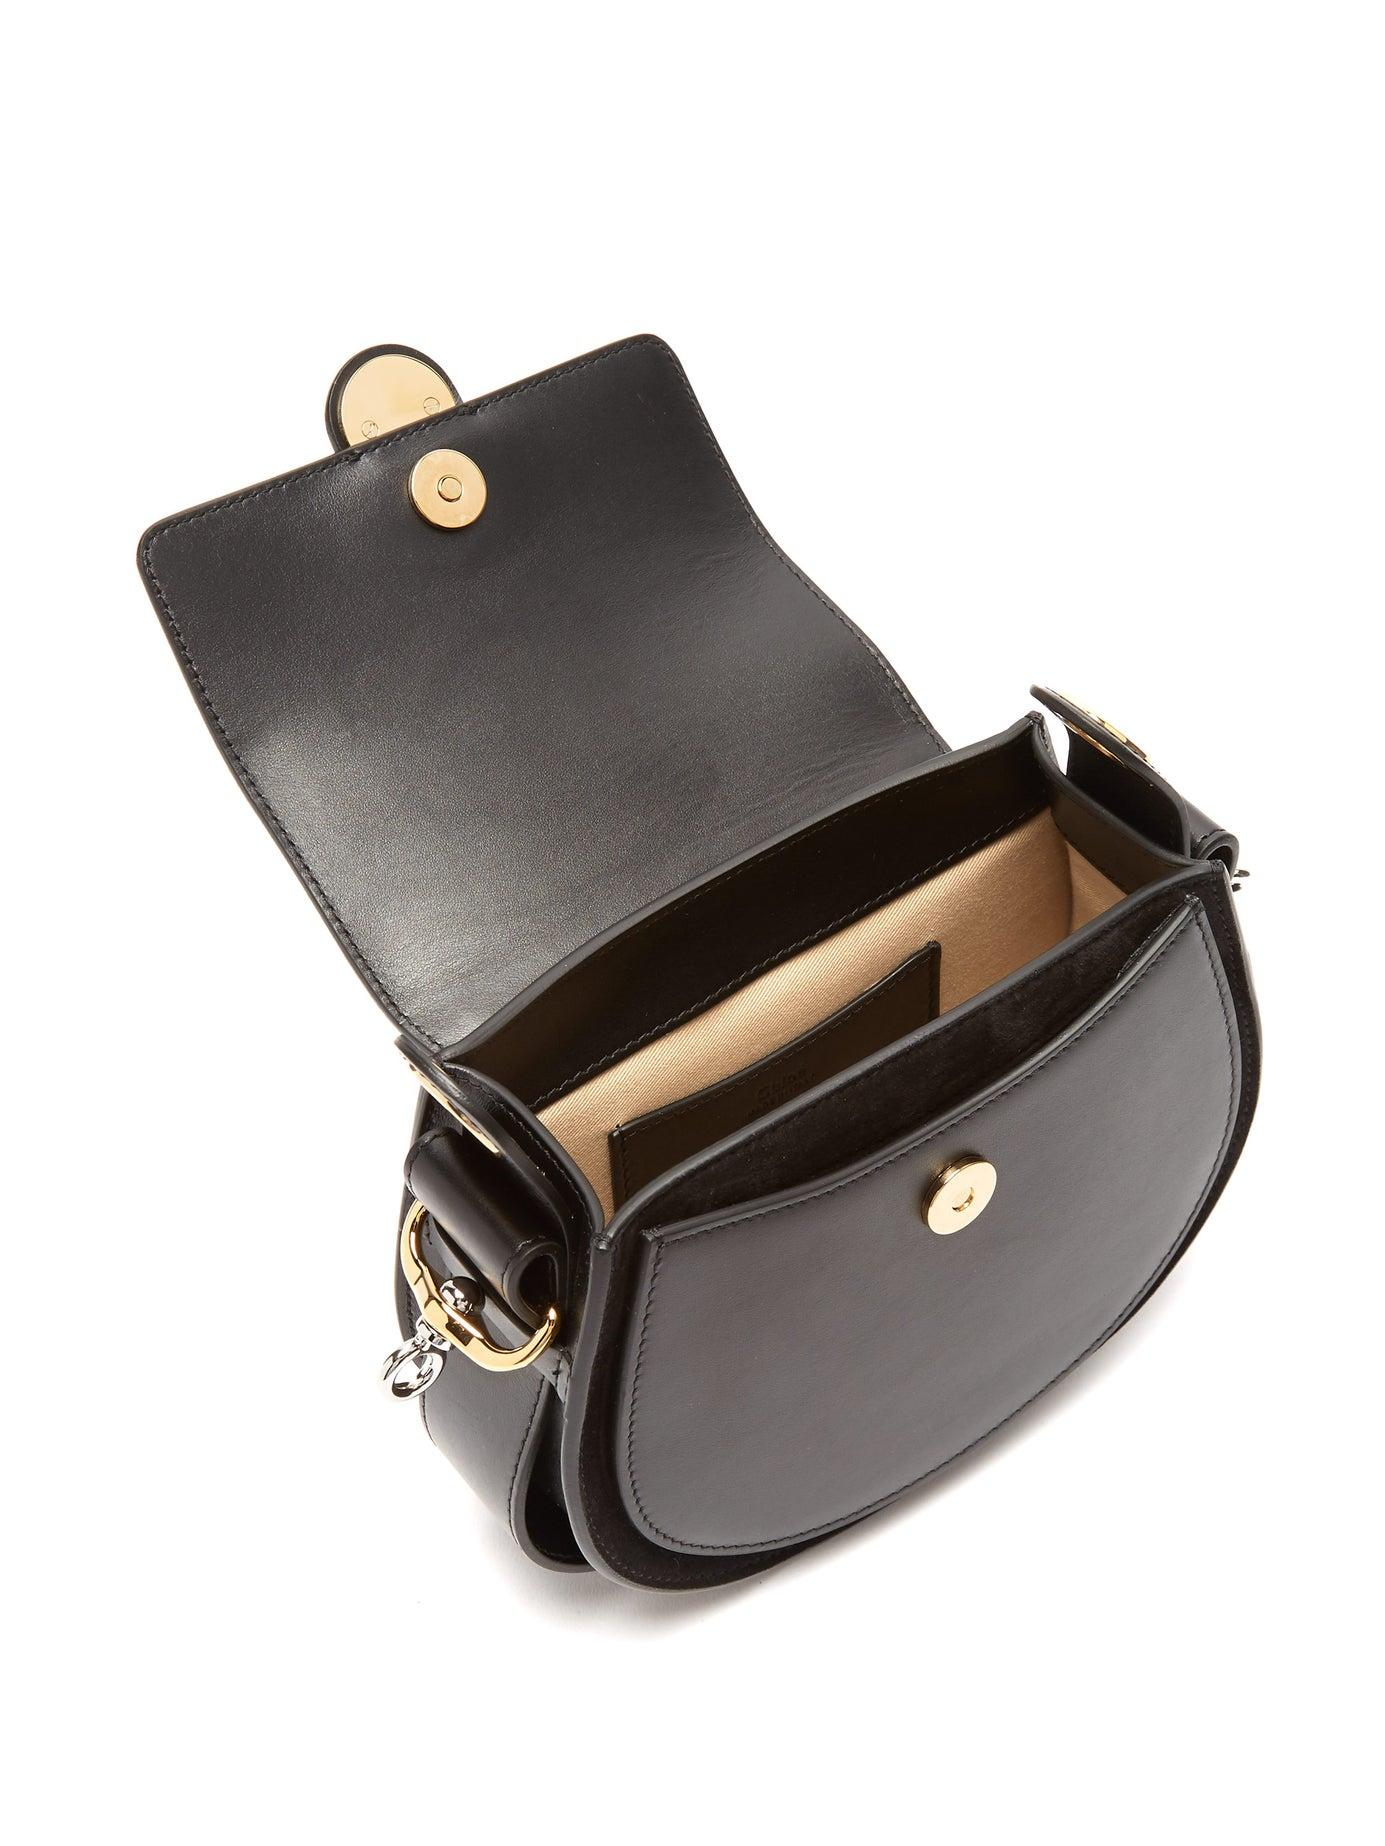 60847865 Chloé Tess Small Leather Cross Body Bag in Black - Lyst